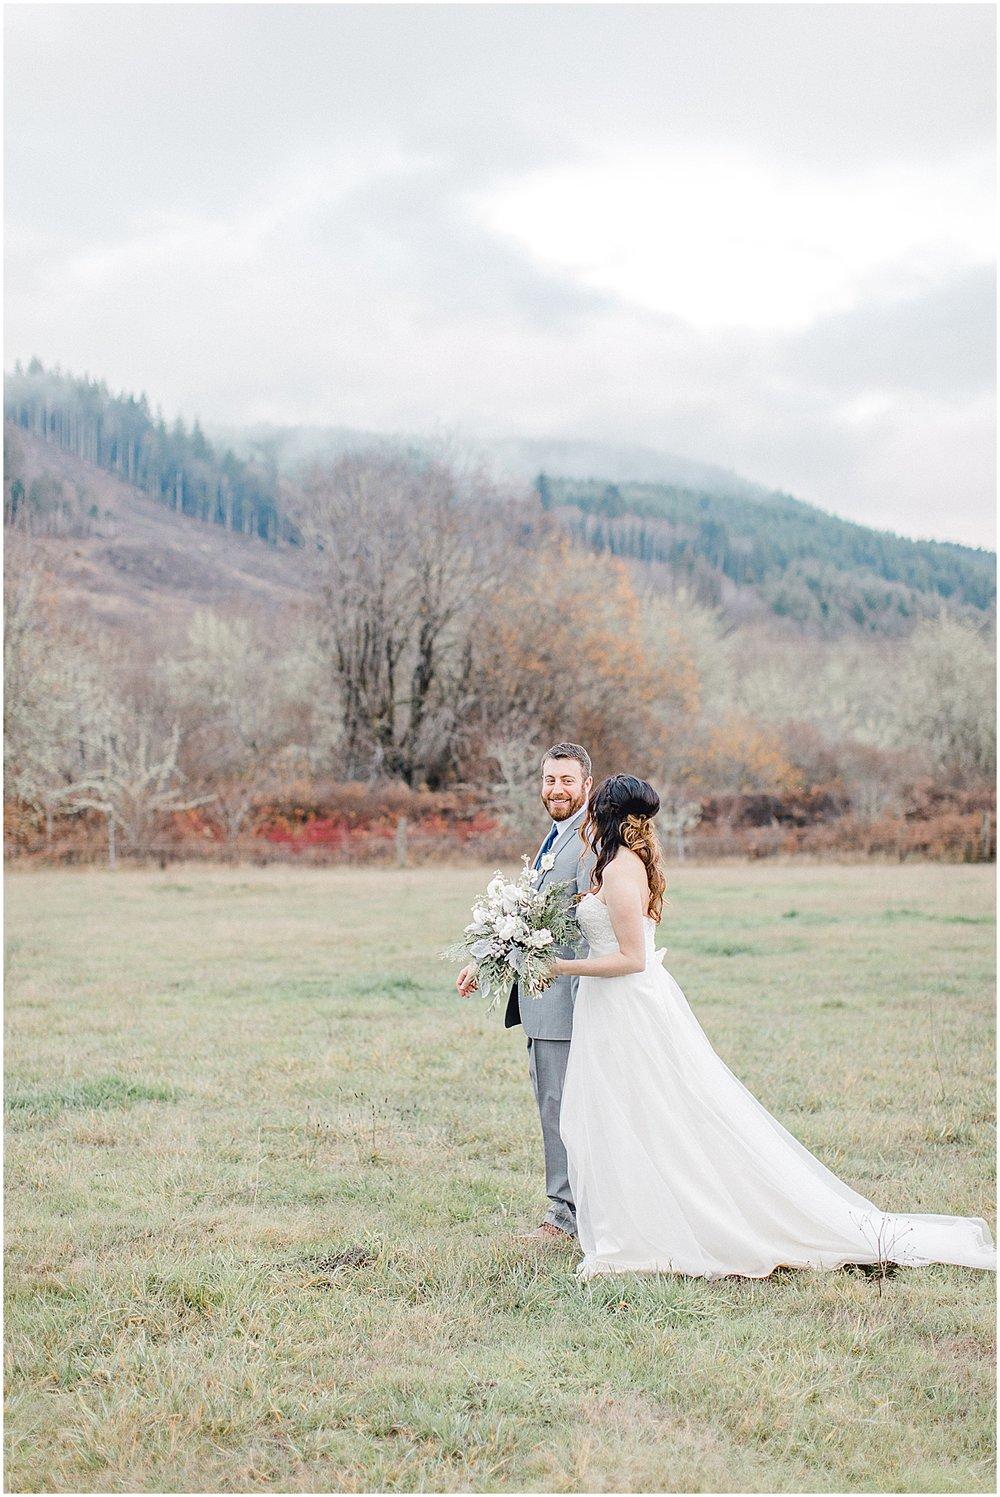 Chehalis Washington Winter Wedding Silver and White | Willapa Hills Farm Wedding | Eastham | Emma Rose Company PNW Light and Airy Wedding Photographer_0085.jpg